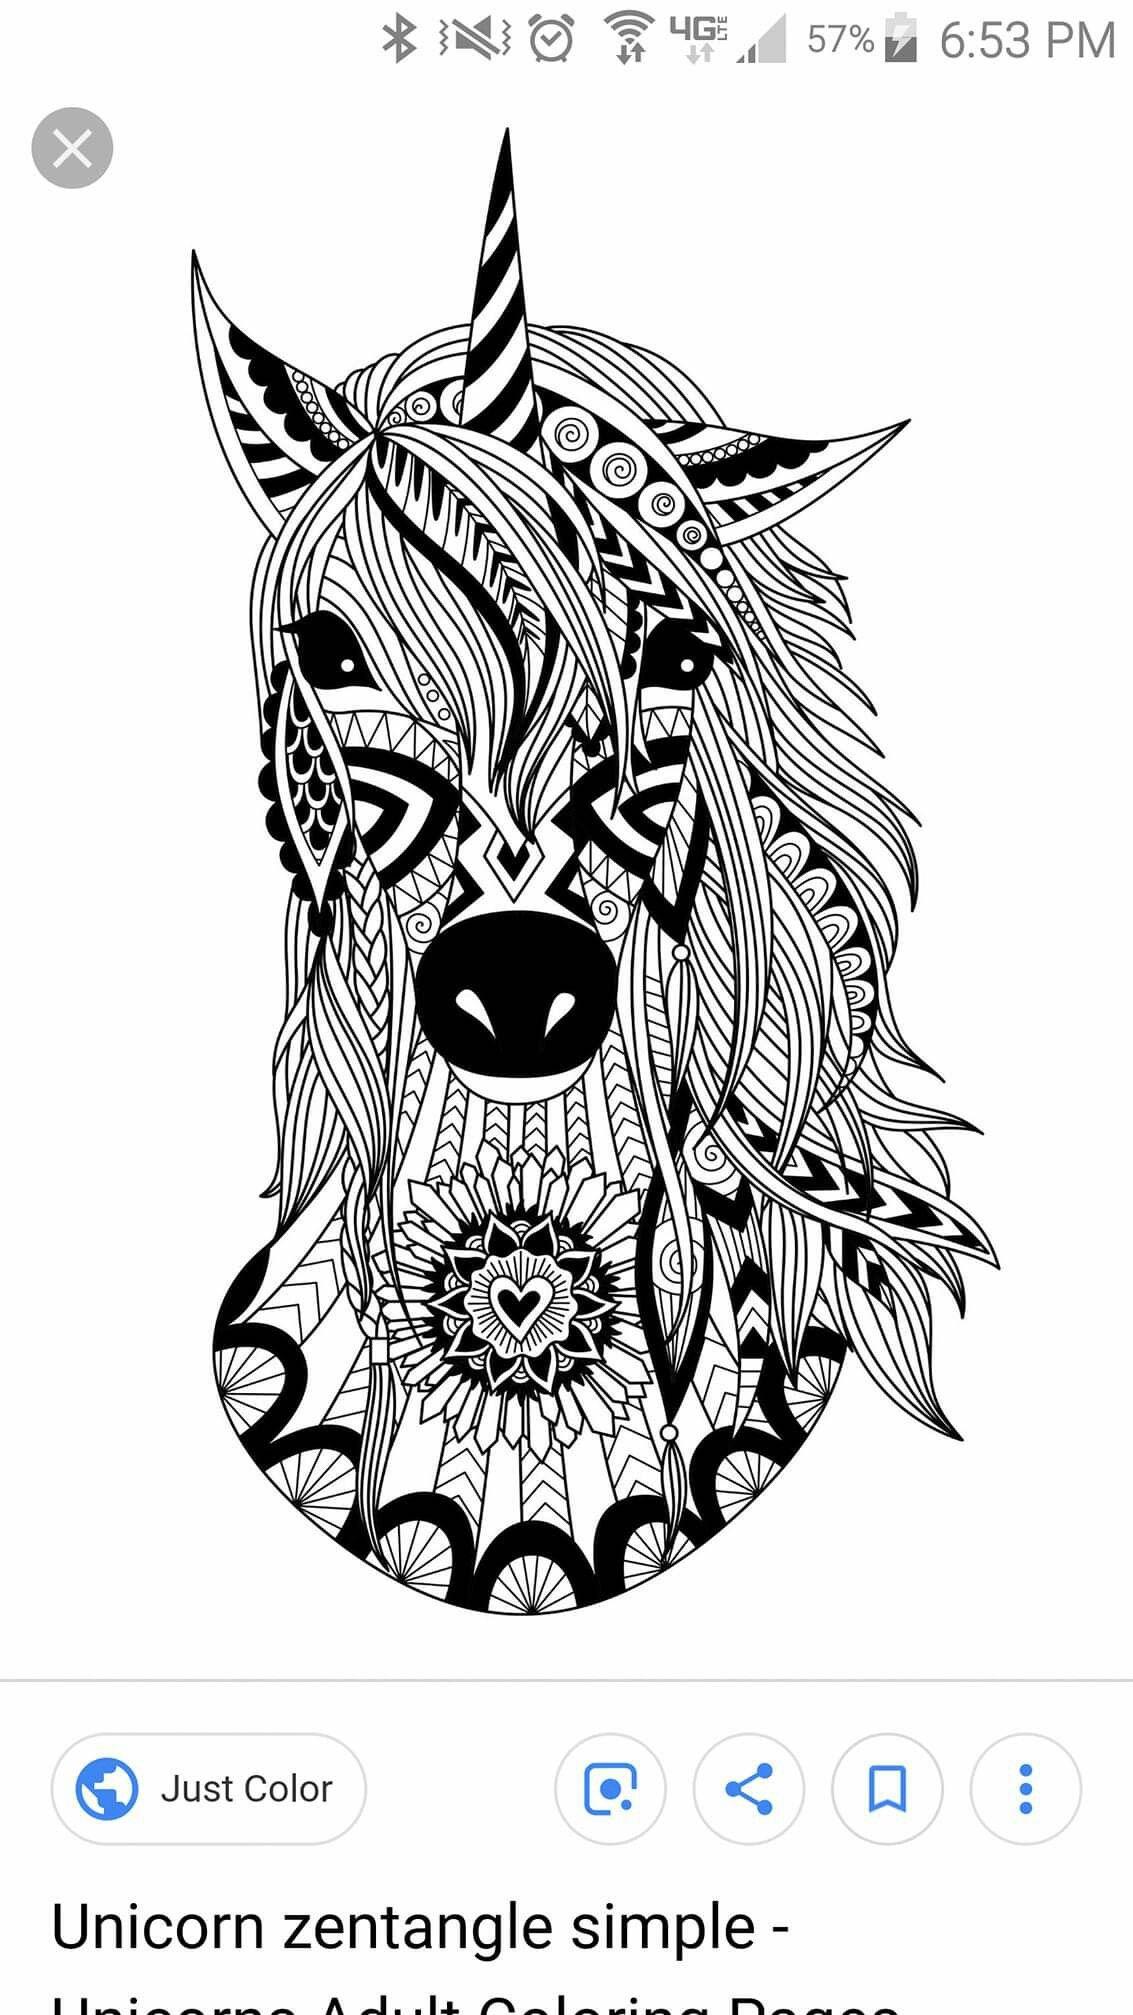 Pin by Kristi Cooper on Silhouette | Unicorn coloring ...